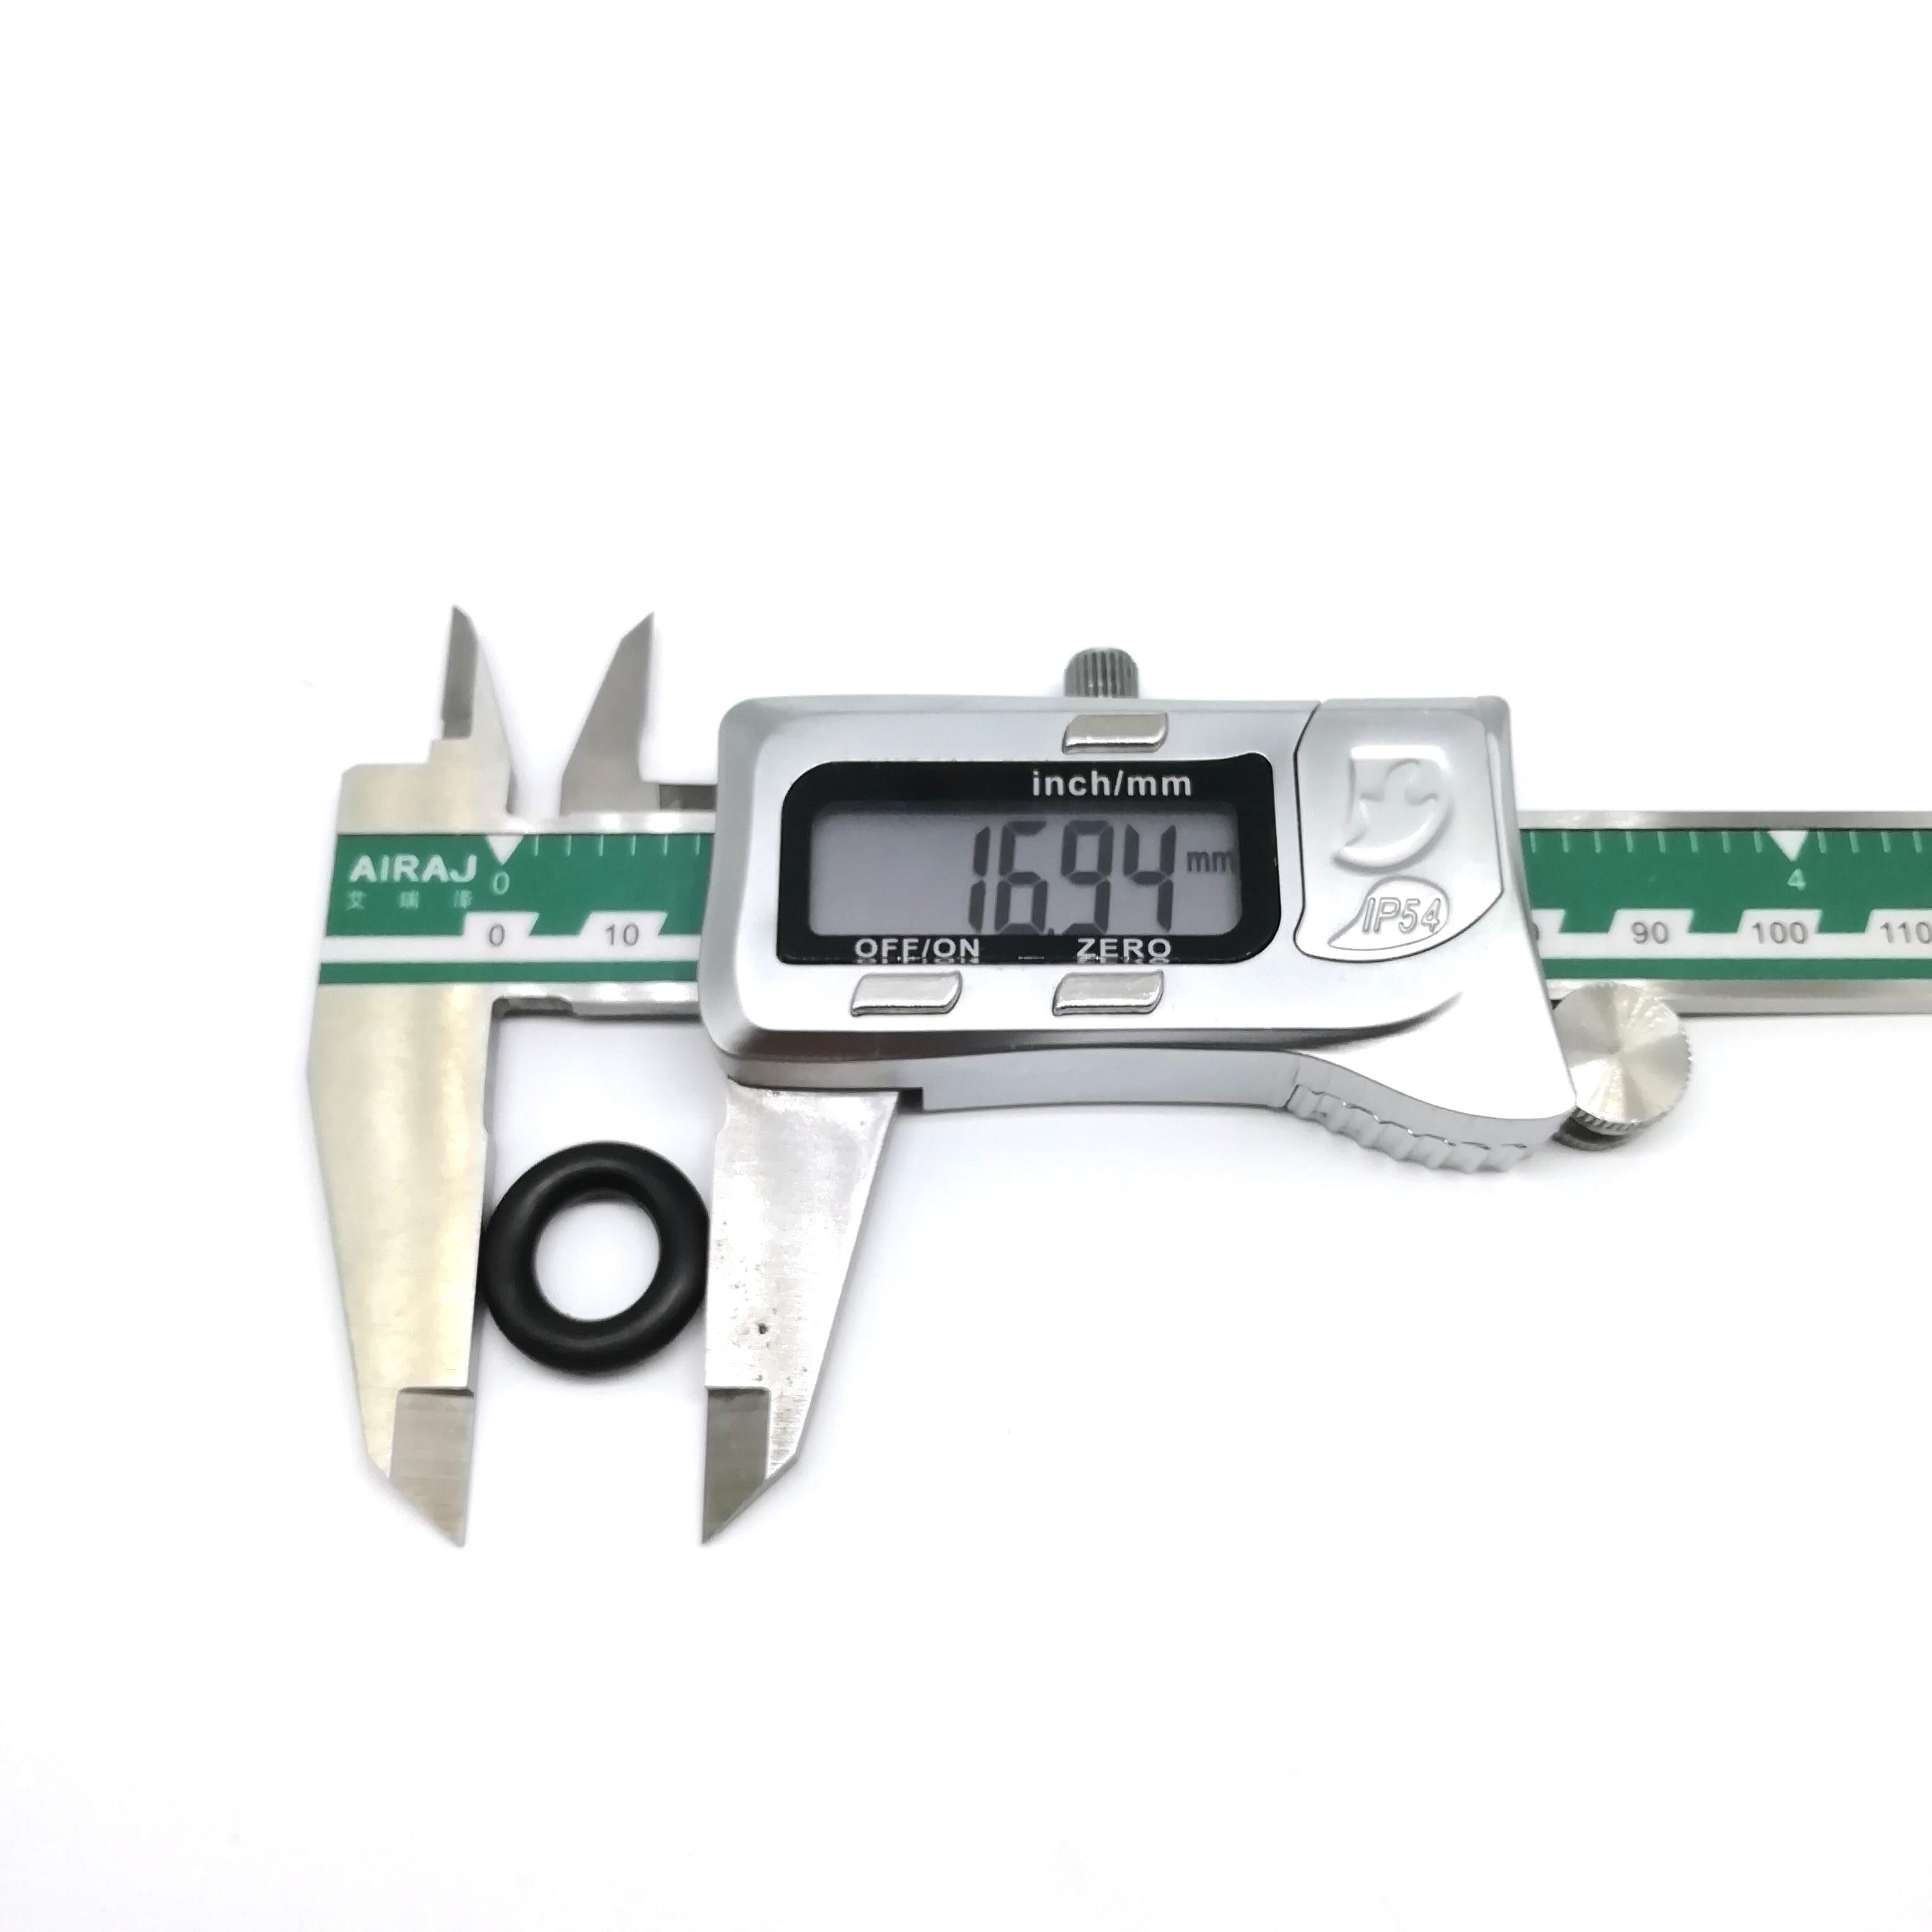 CS6000 CE5500 2 BOBBIN WINDER RUBBER TIRE X55238051 fits BROTHER XL2600